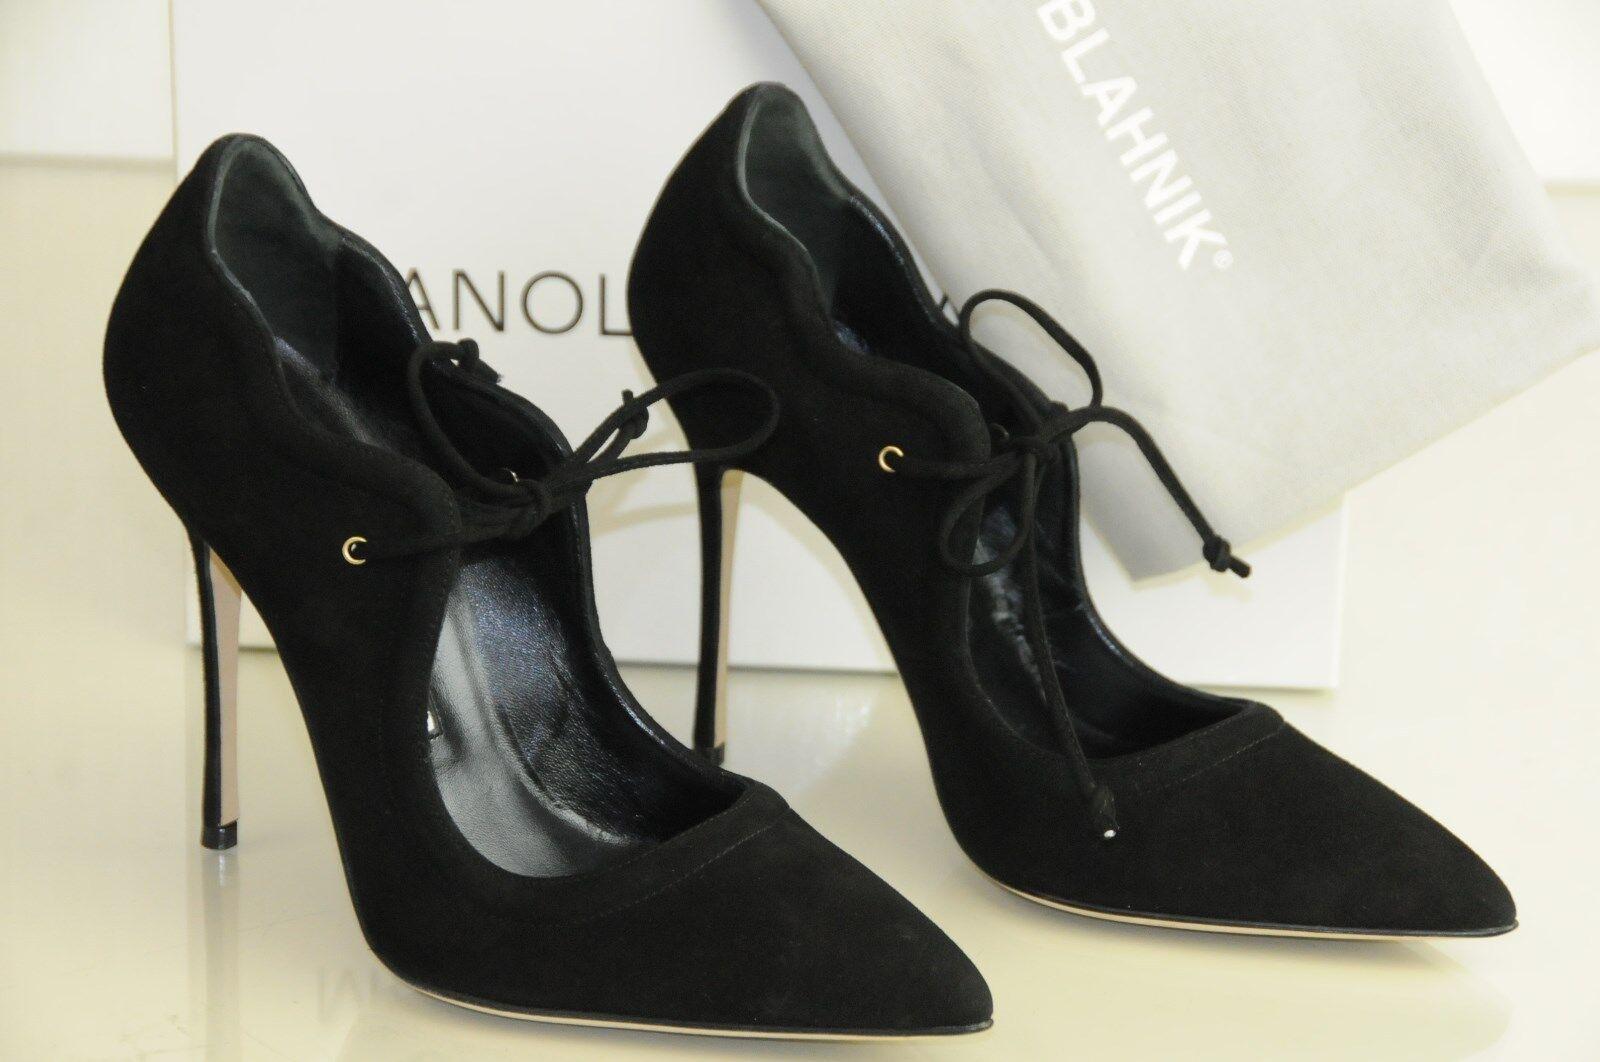 New New New Manolo Blahnik BB REFOLADA 115 Black Suede Pumps 4.5 Heels shoes 37 37.5 40 7ebb8a